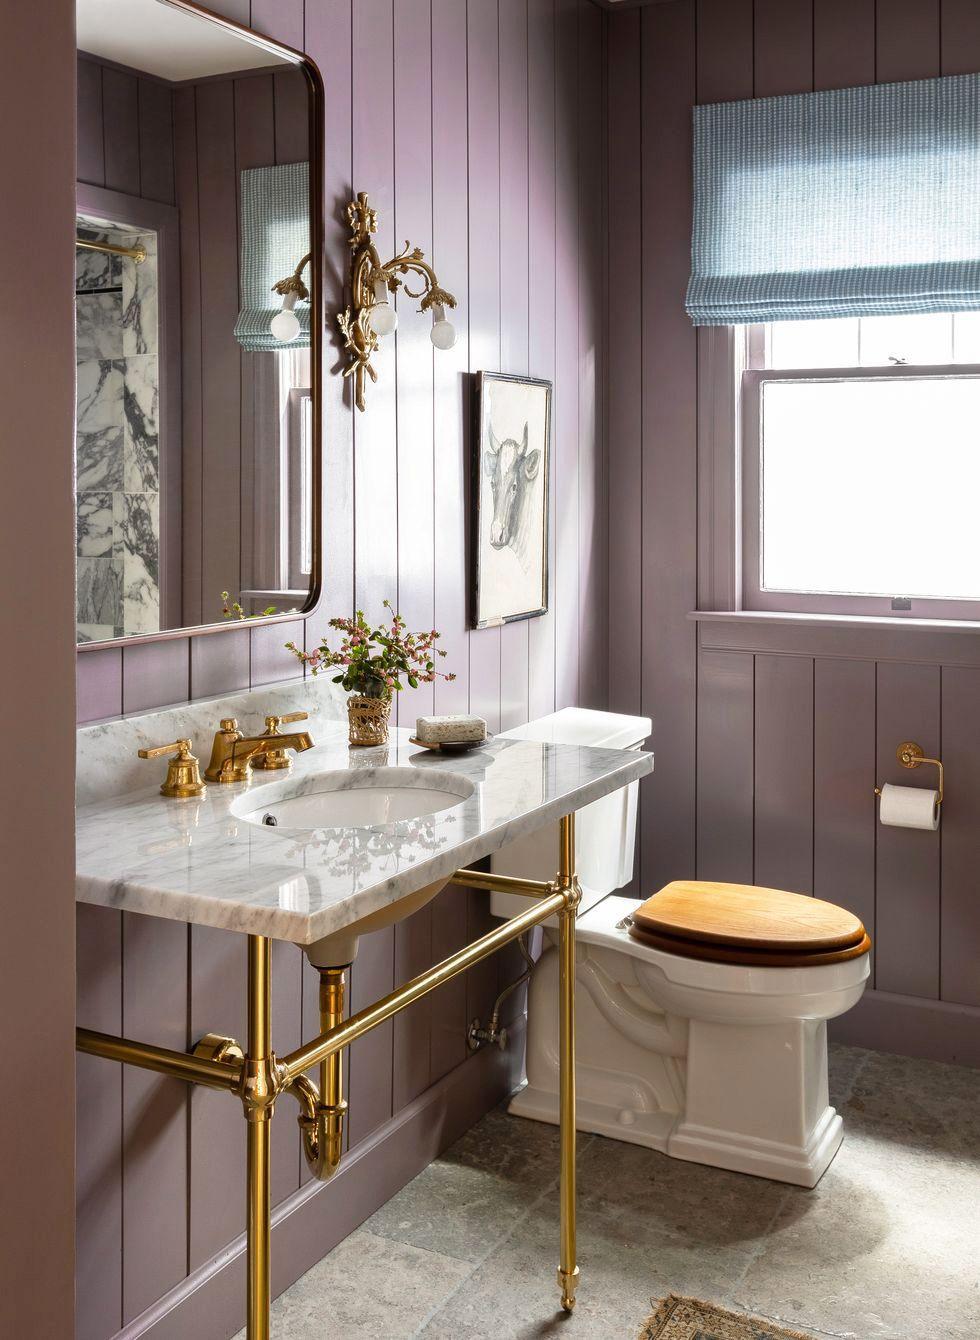 35 design ideas that will make small bathrooms feel so